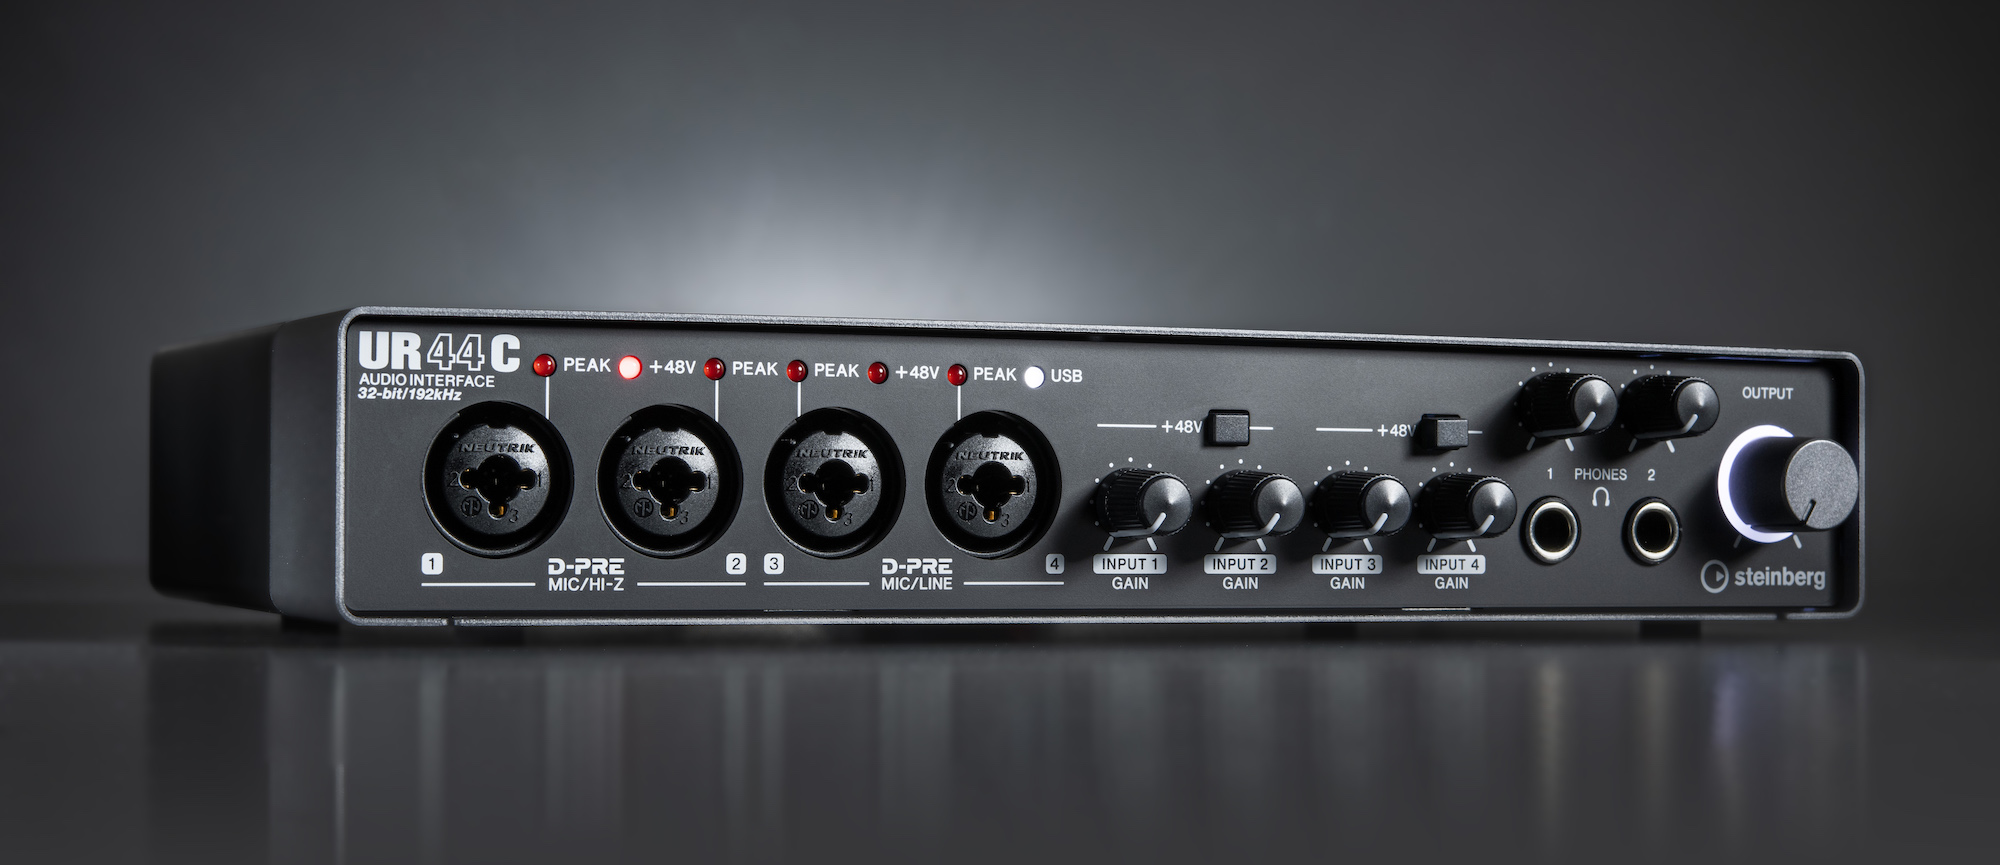 Steinberg USB-C audio interfaces for Mac iPad Pro